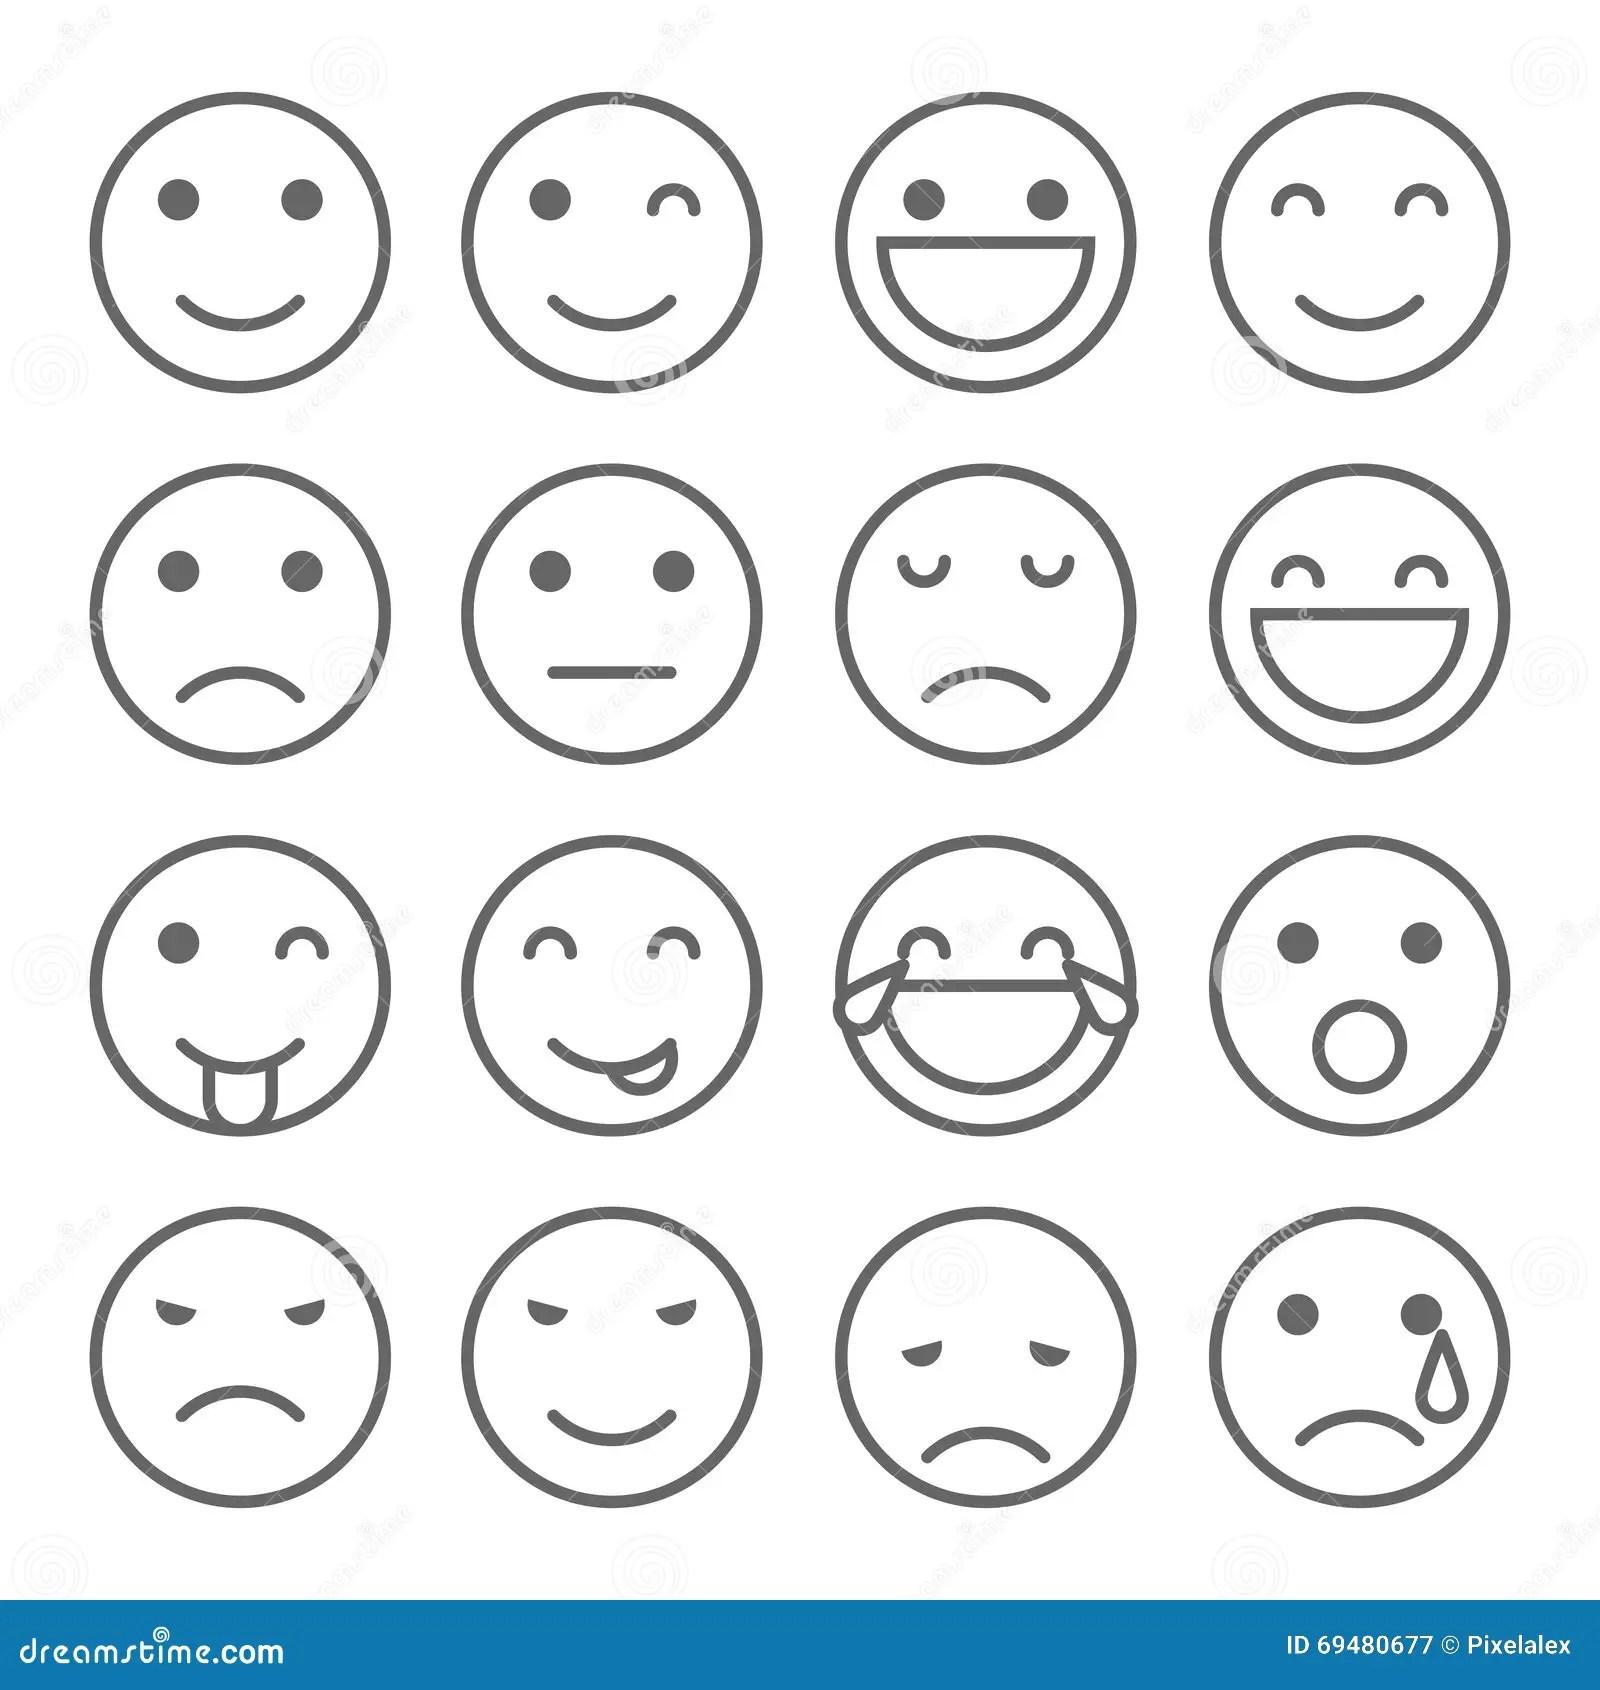 Emoji Faces Simple Icons Stock Illustration